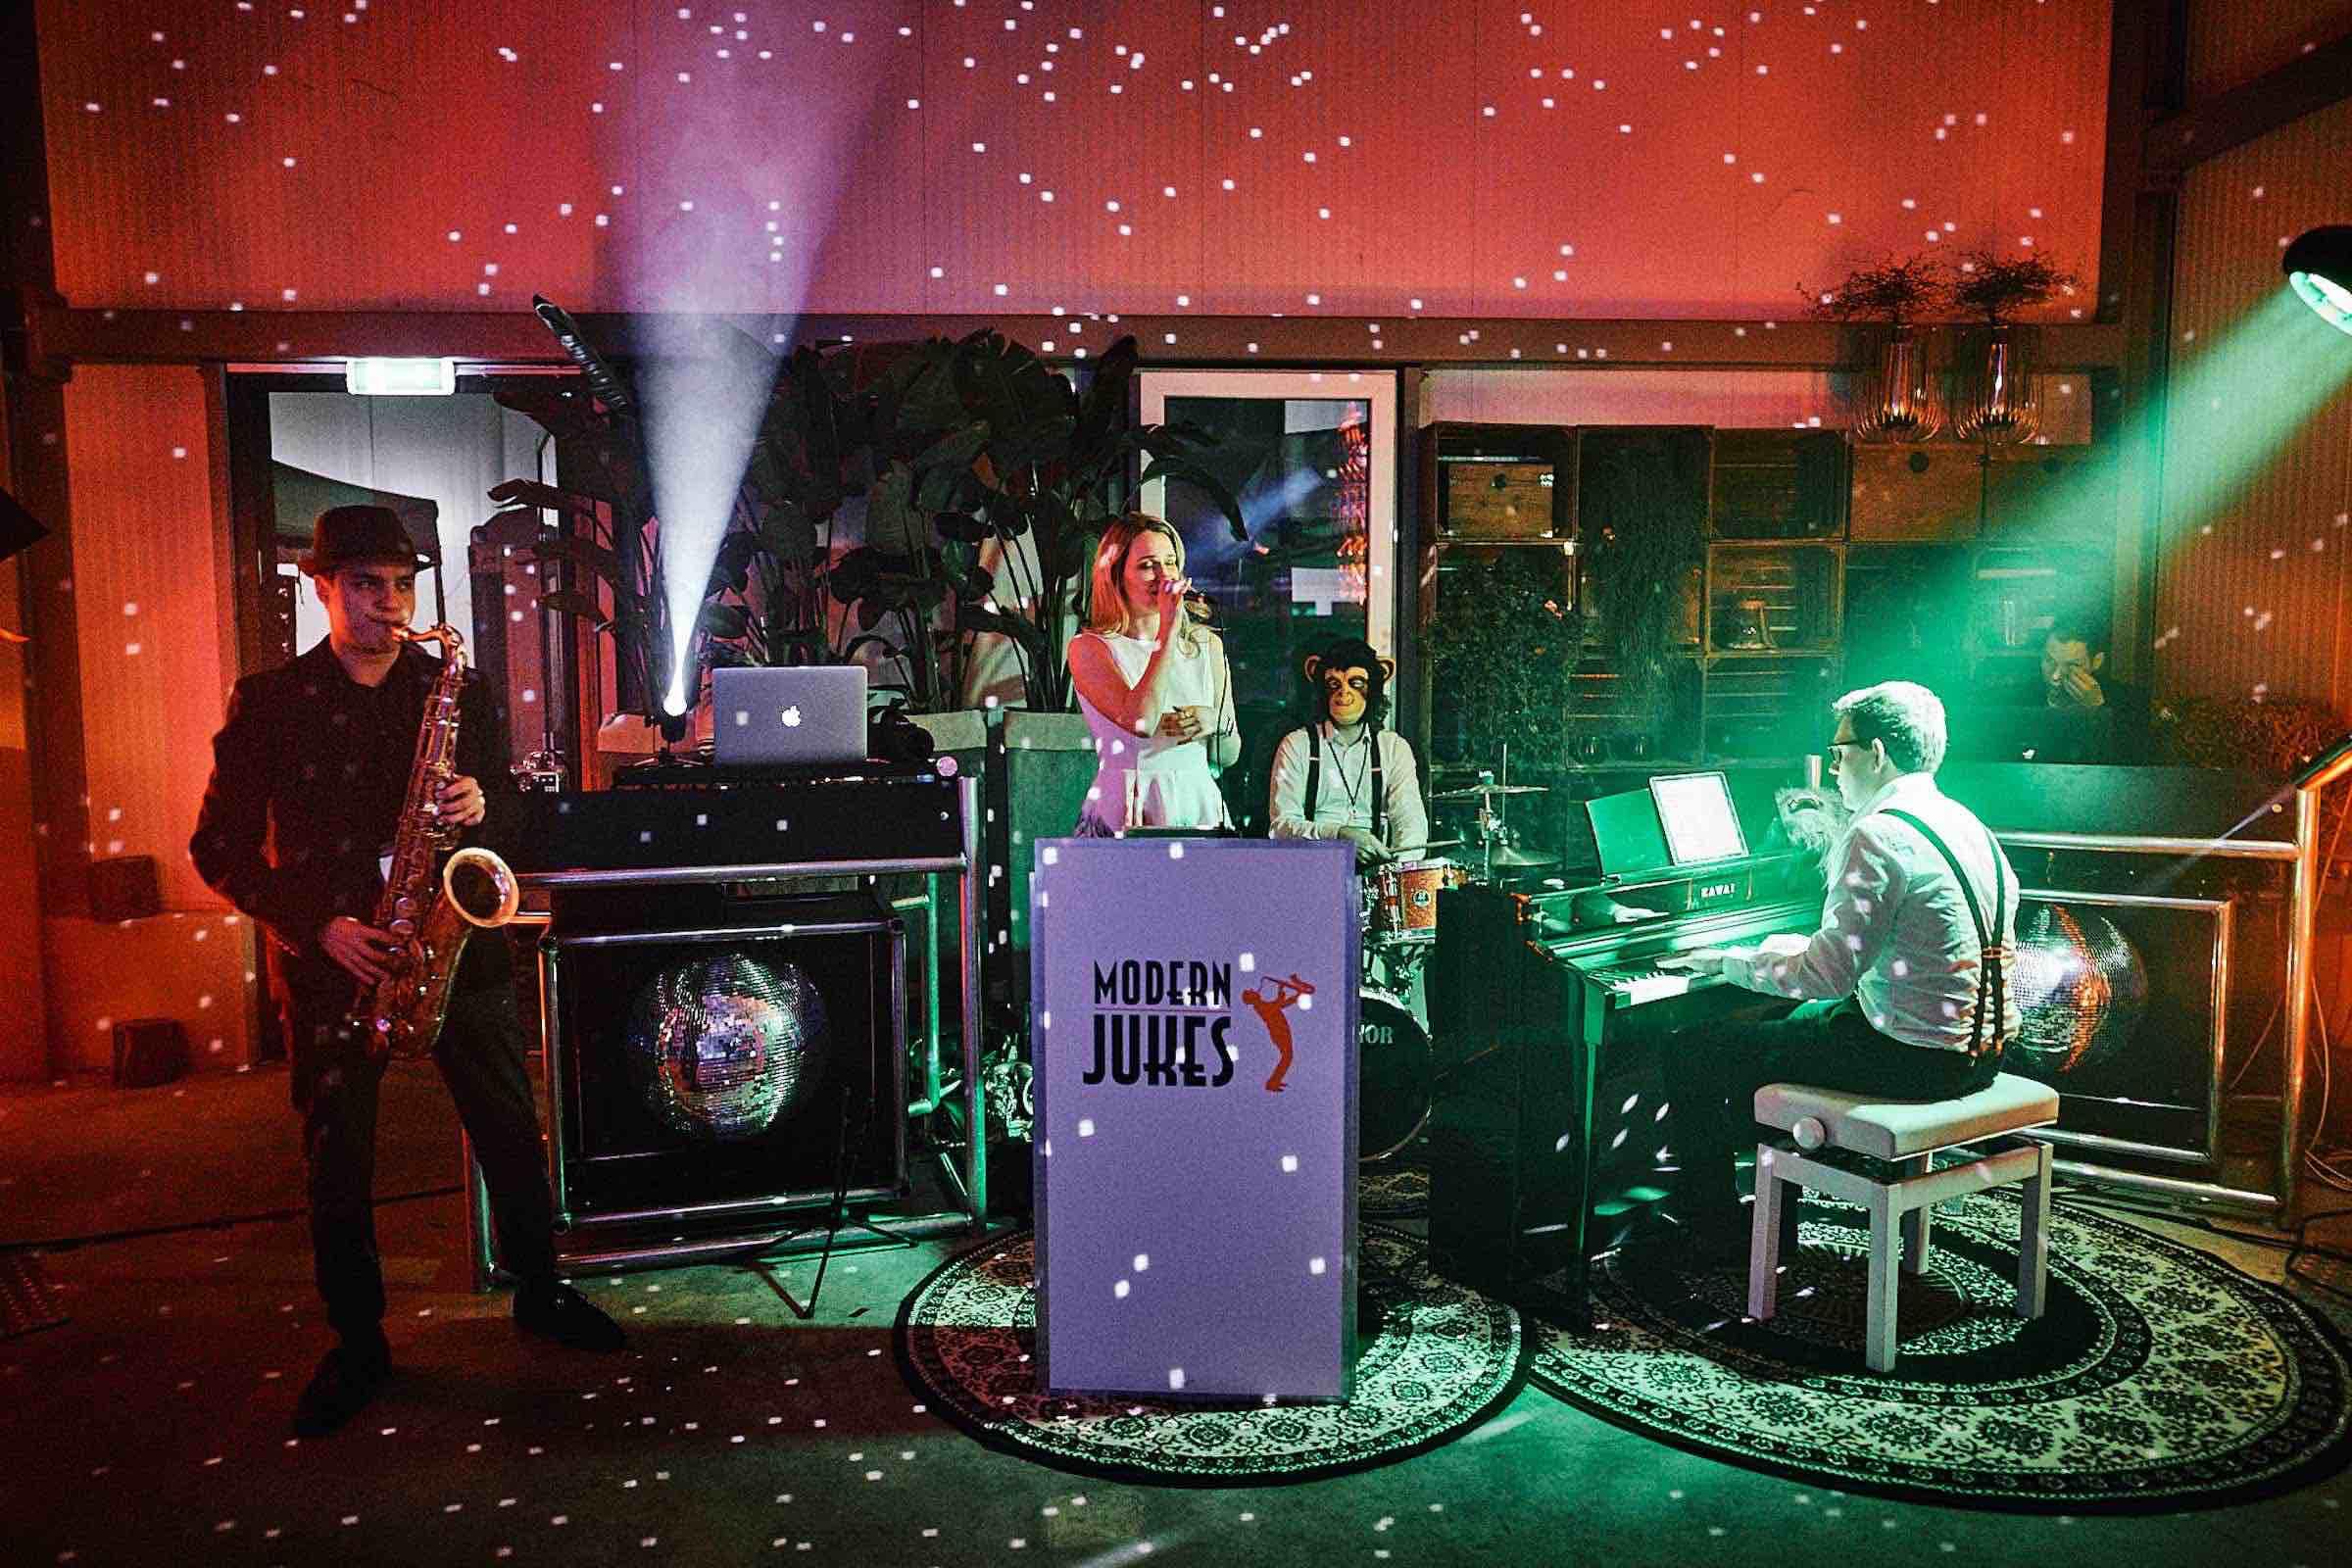 Band | Hamburg | Liveband | Livemusik | Partyband | Jazzband | Swingband | Lounge | Hochzeitsband | Popband | Jazz | Motown | Soul | Hochzeit | Messe | Firmenfeier | Charity | Gala | Buchen | Mieten | Anfragen | Hamburgfeiert